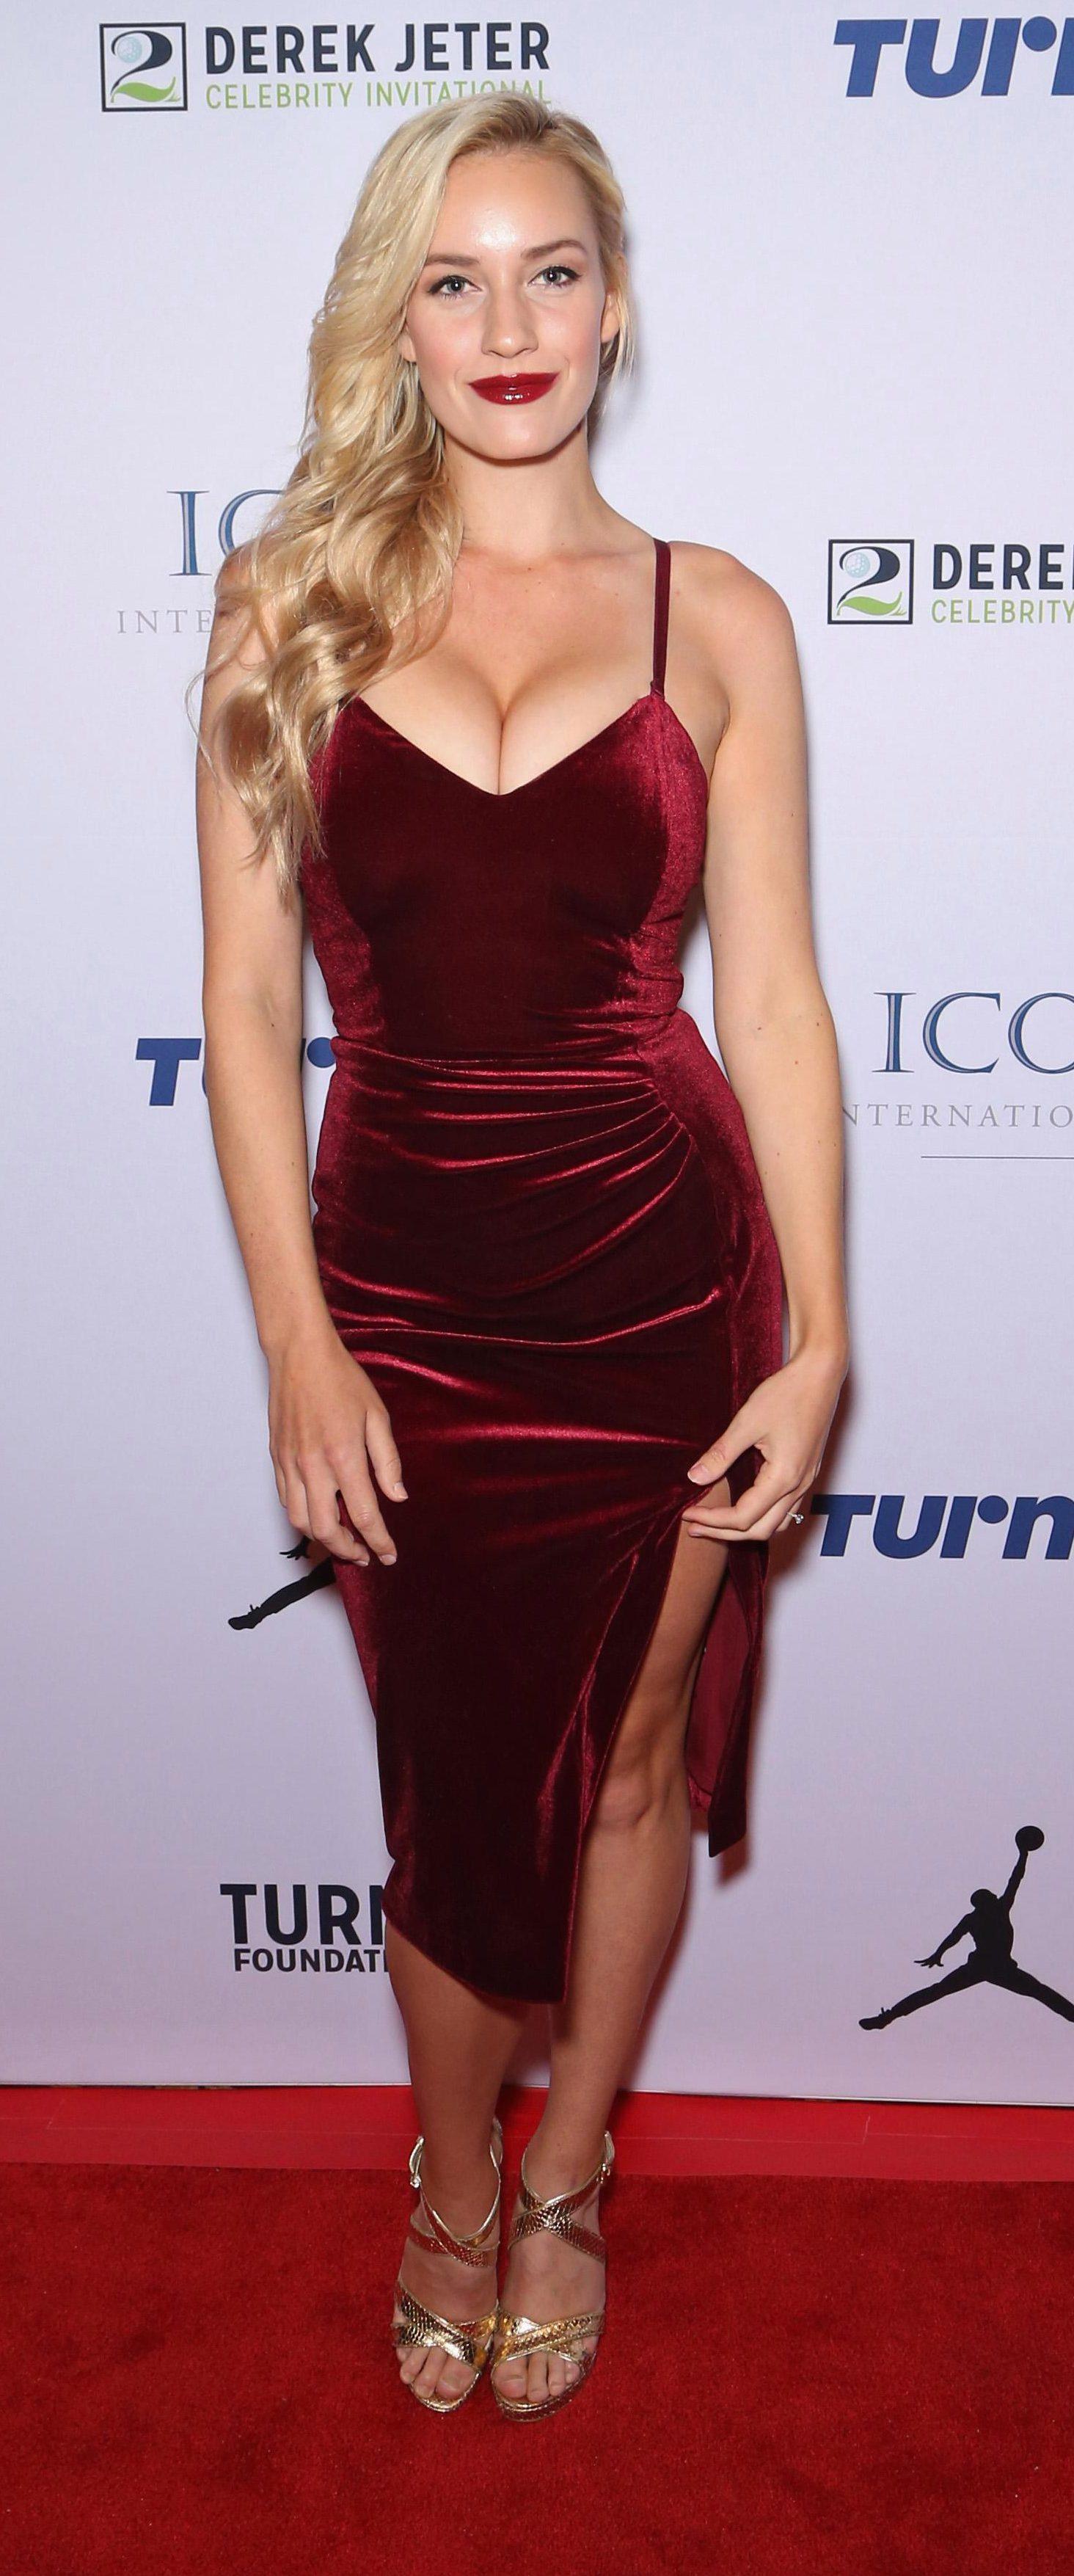 PThe 24-year-old attended the 2017 Derek Jeter Celebrity Invitational gala in Las Vegas, Nevada